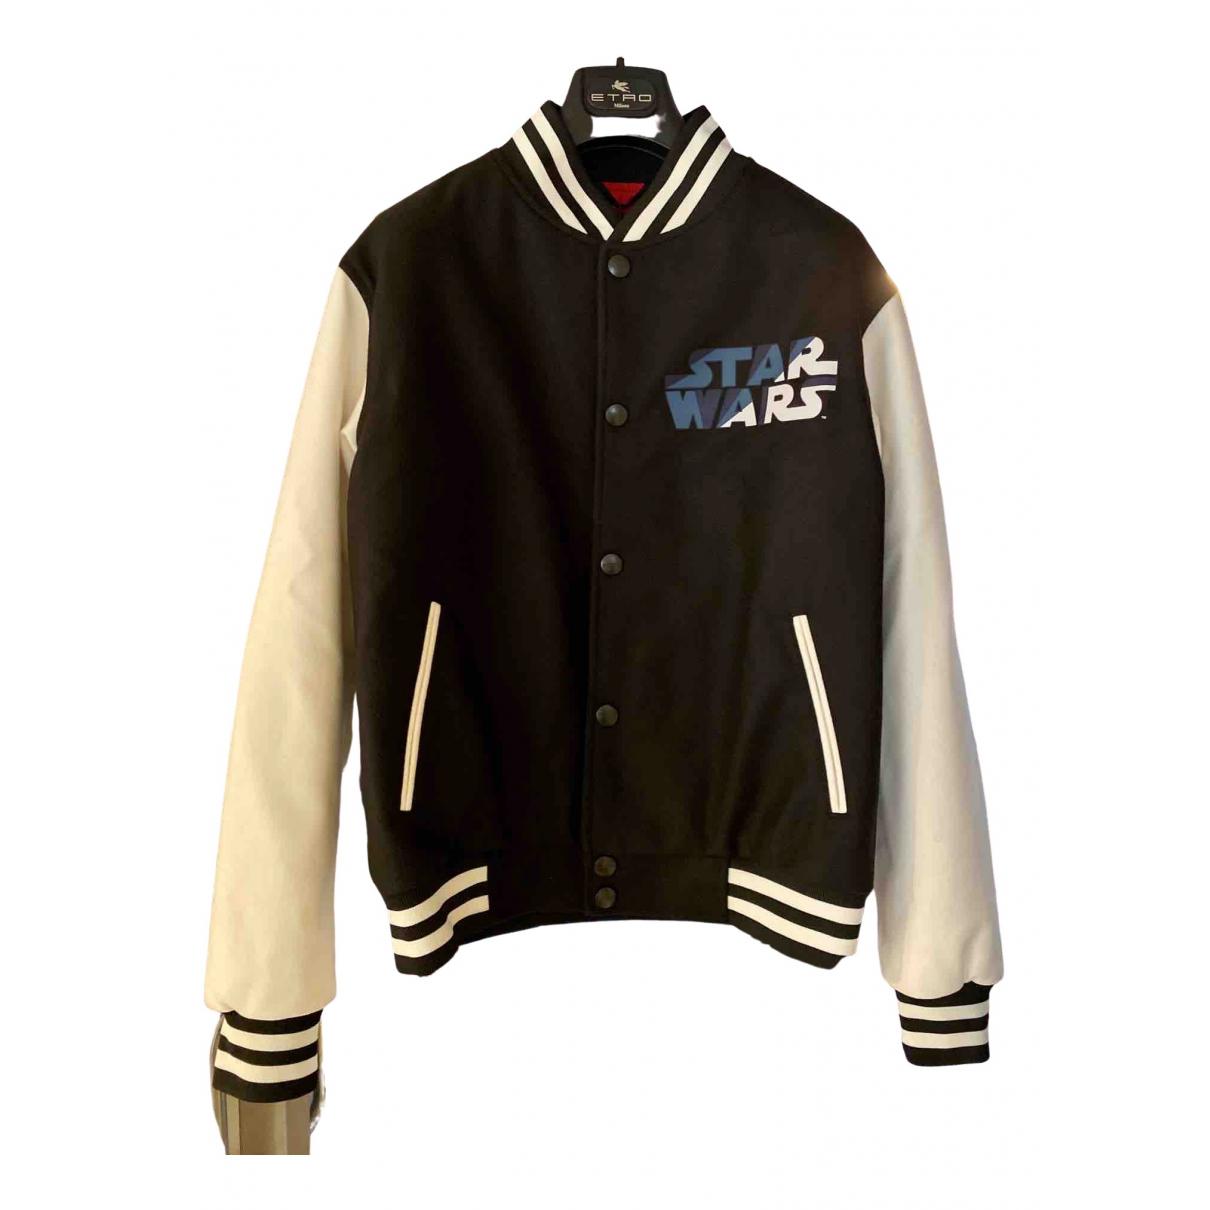 Etro \N Black Wool jacket  for Men S International